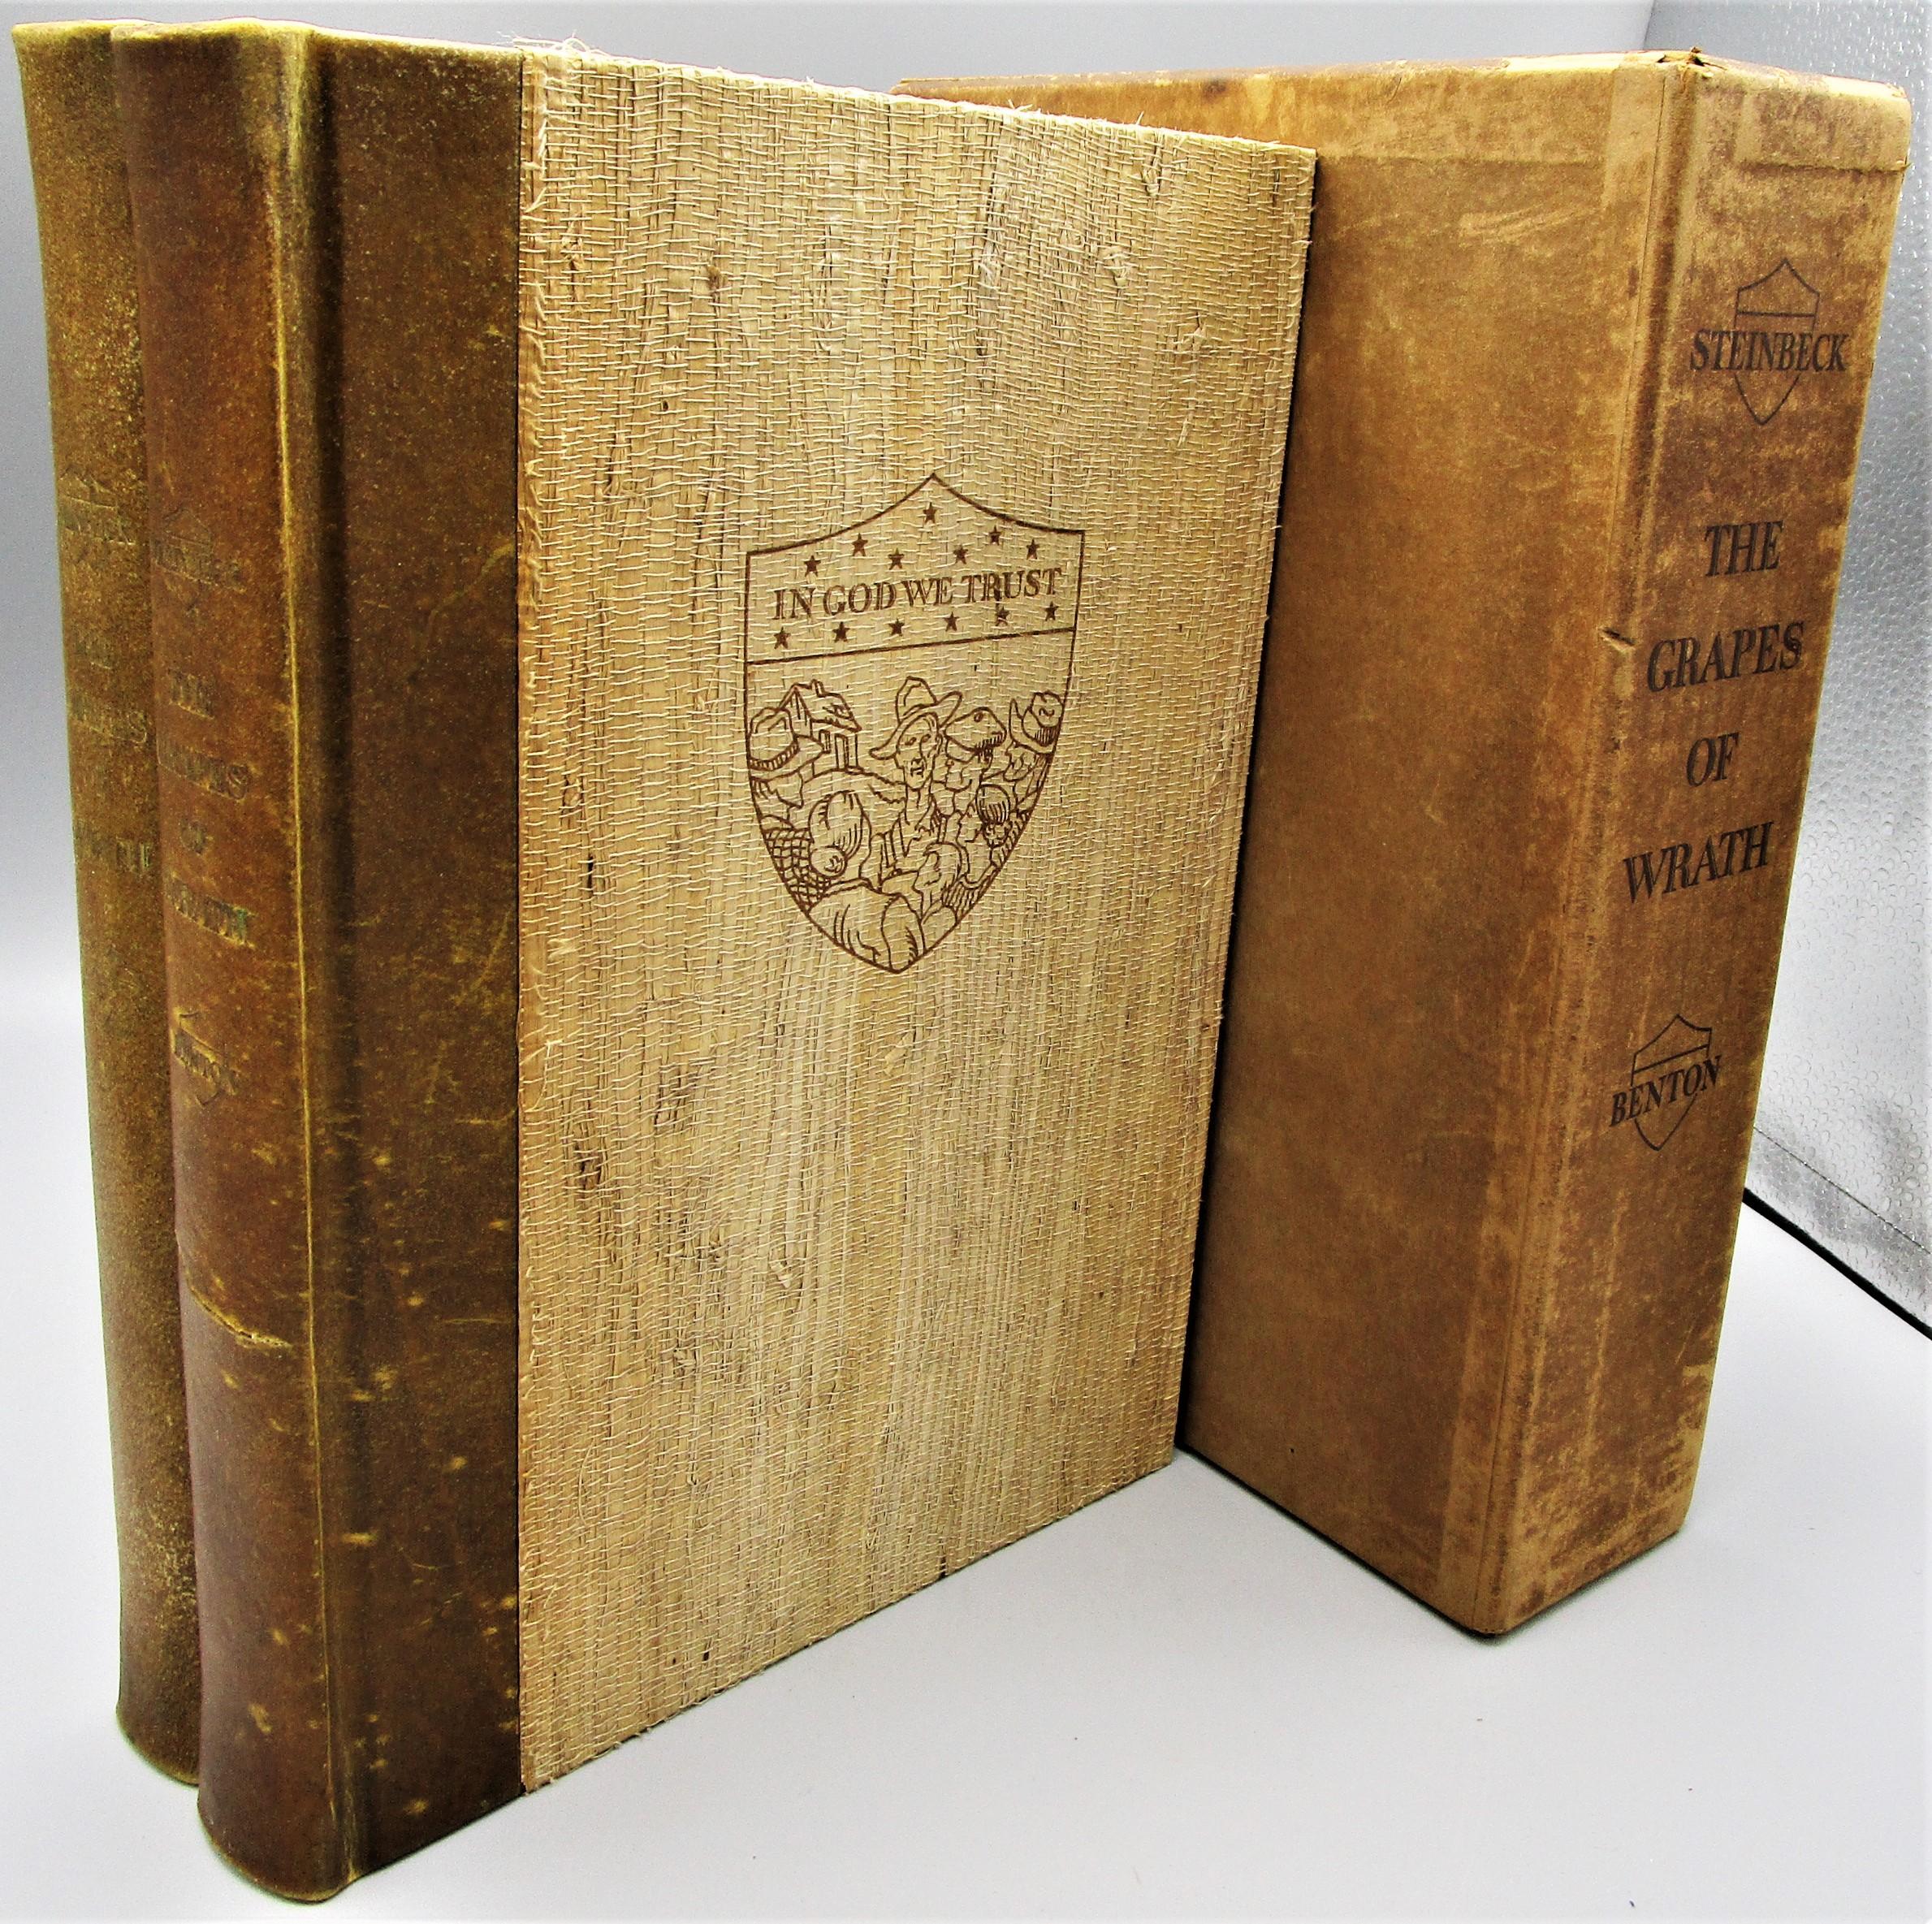 THE GRAPES OF WRATH, by John Steinbeck; Thomas Hart Benton (illus) - 1940 [2 Vols, Signed Ltd Ed]]